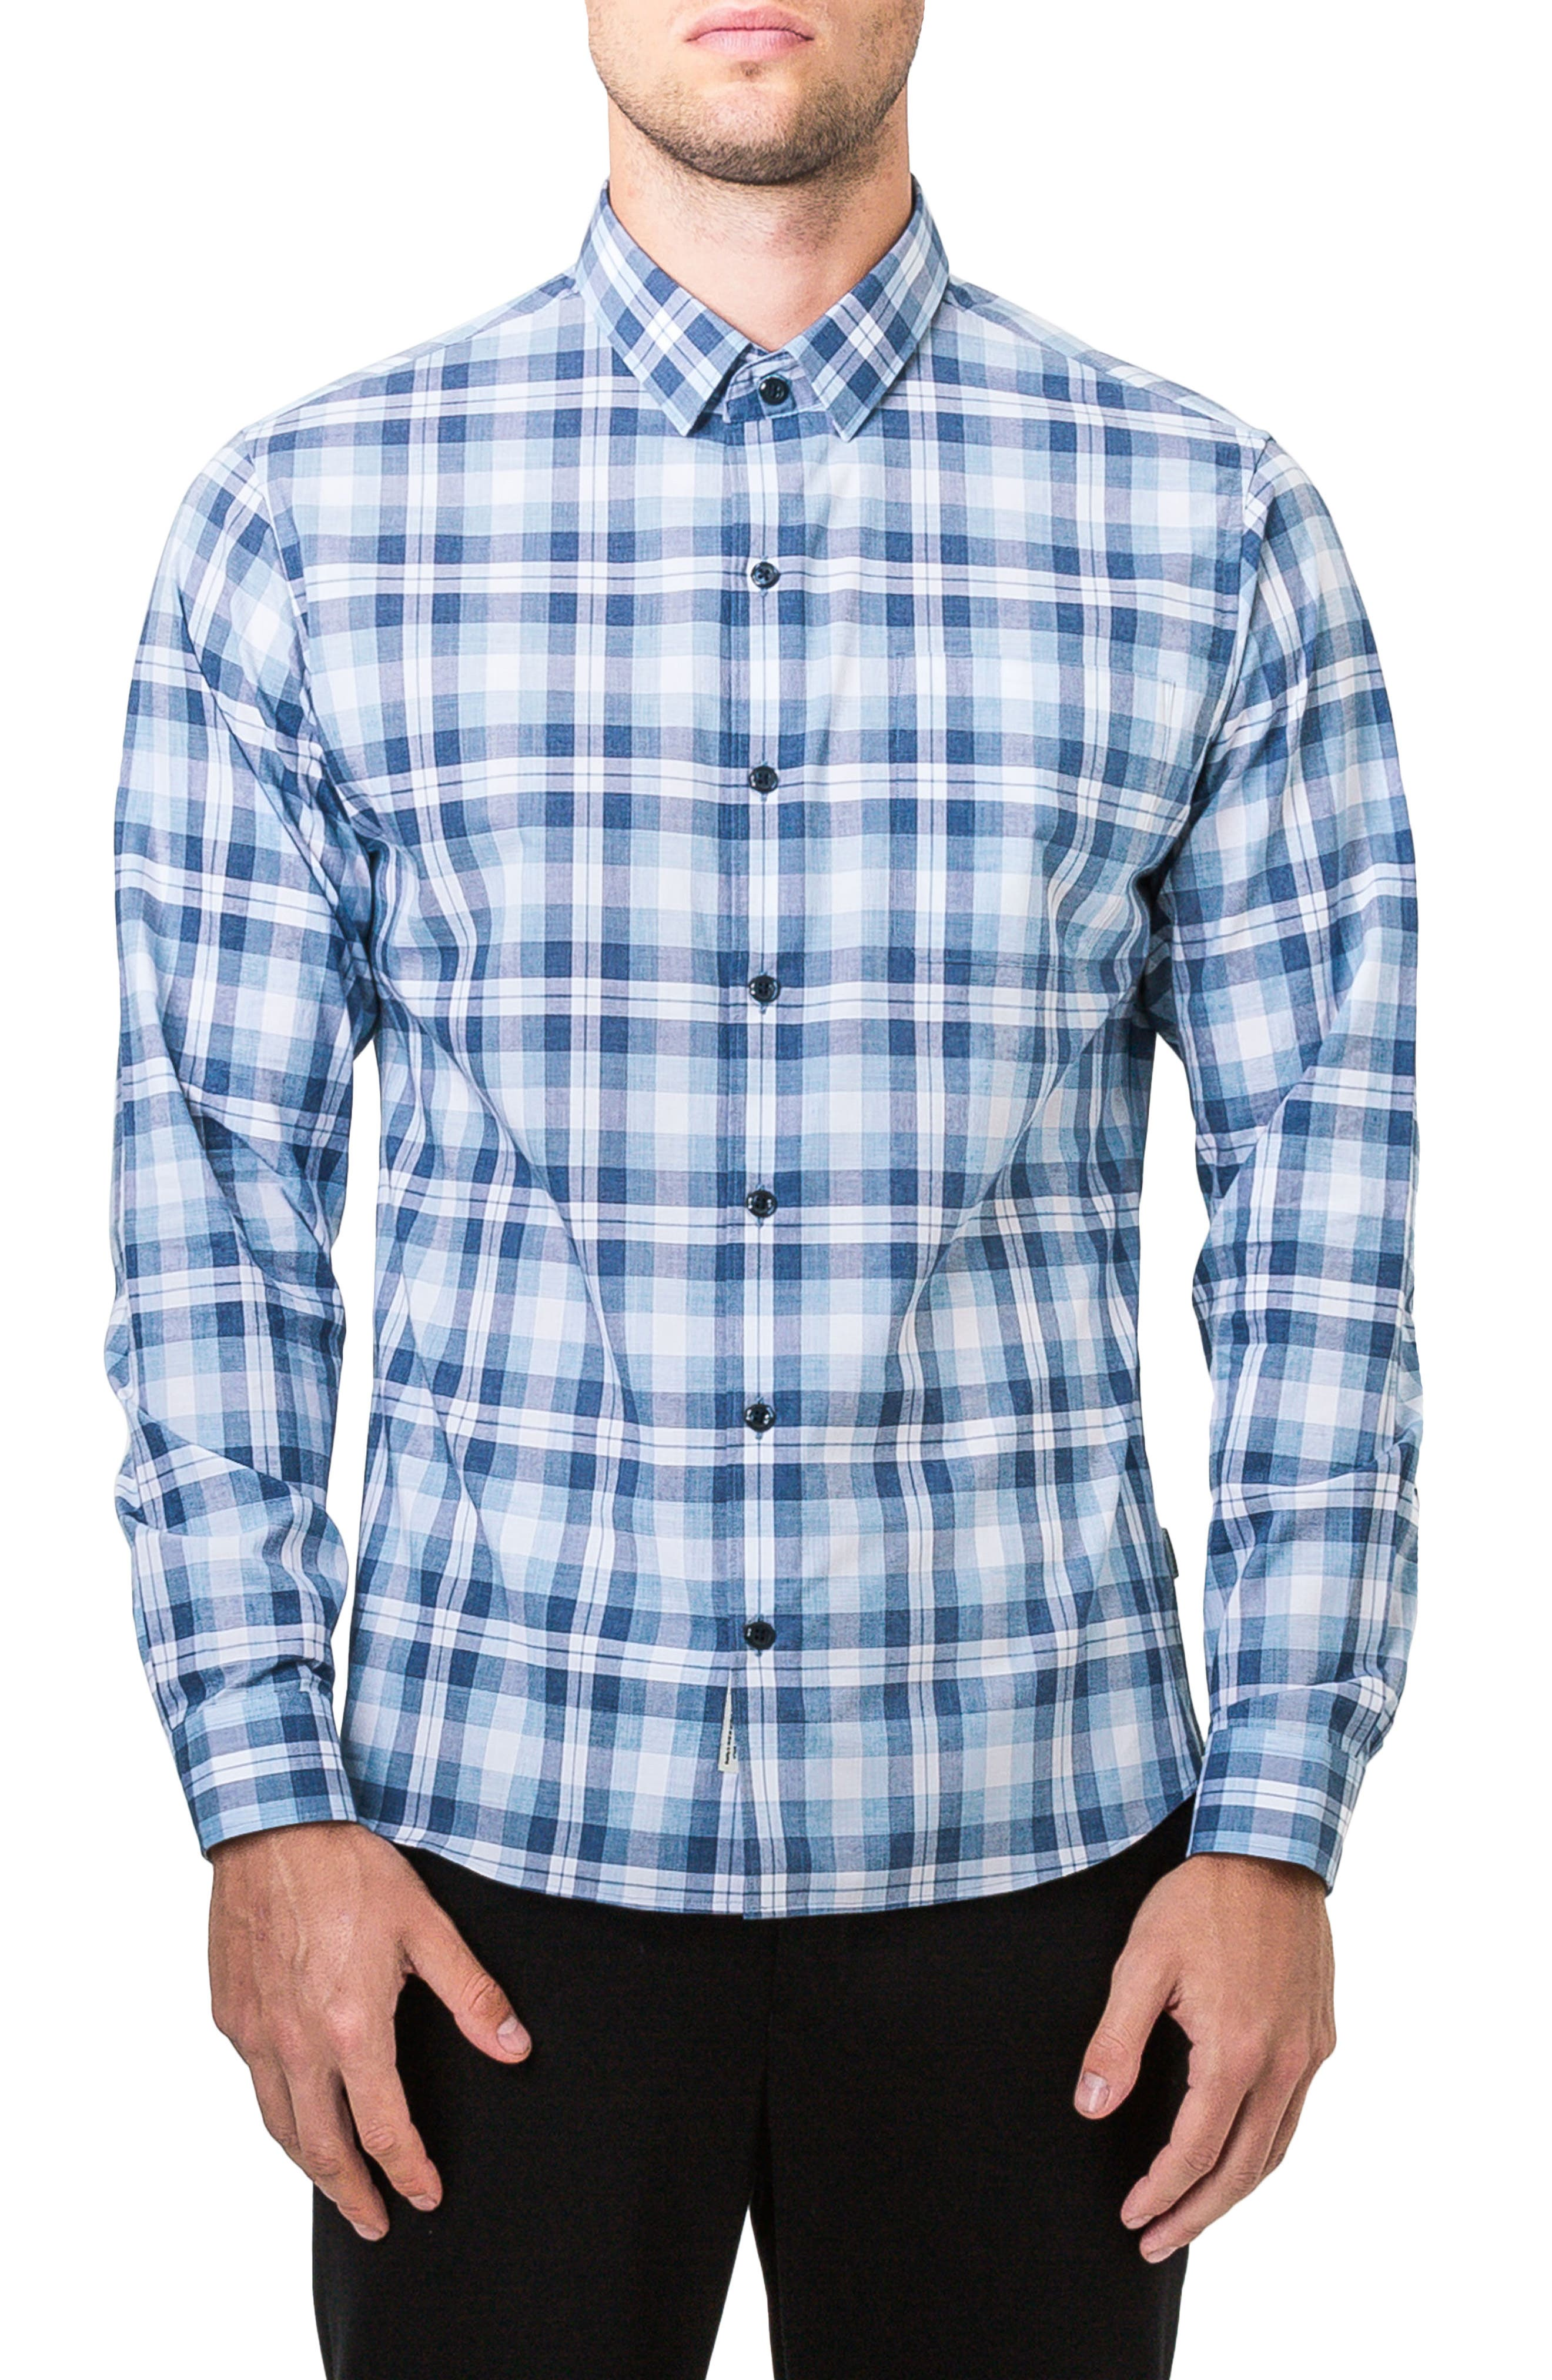 Morning Rain Woven Shirt,                         Main,                         color, 400